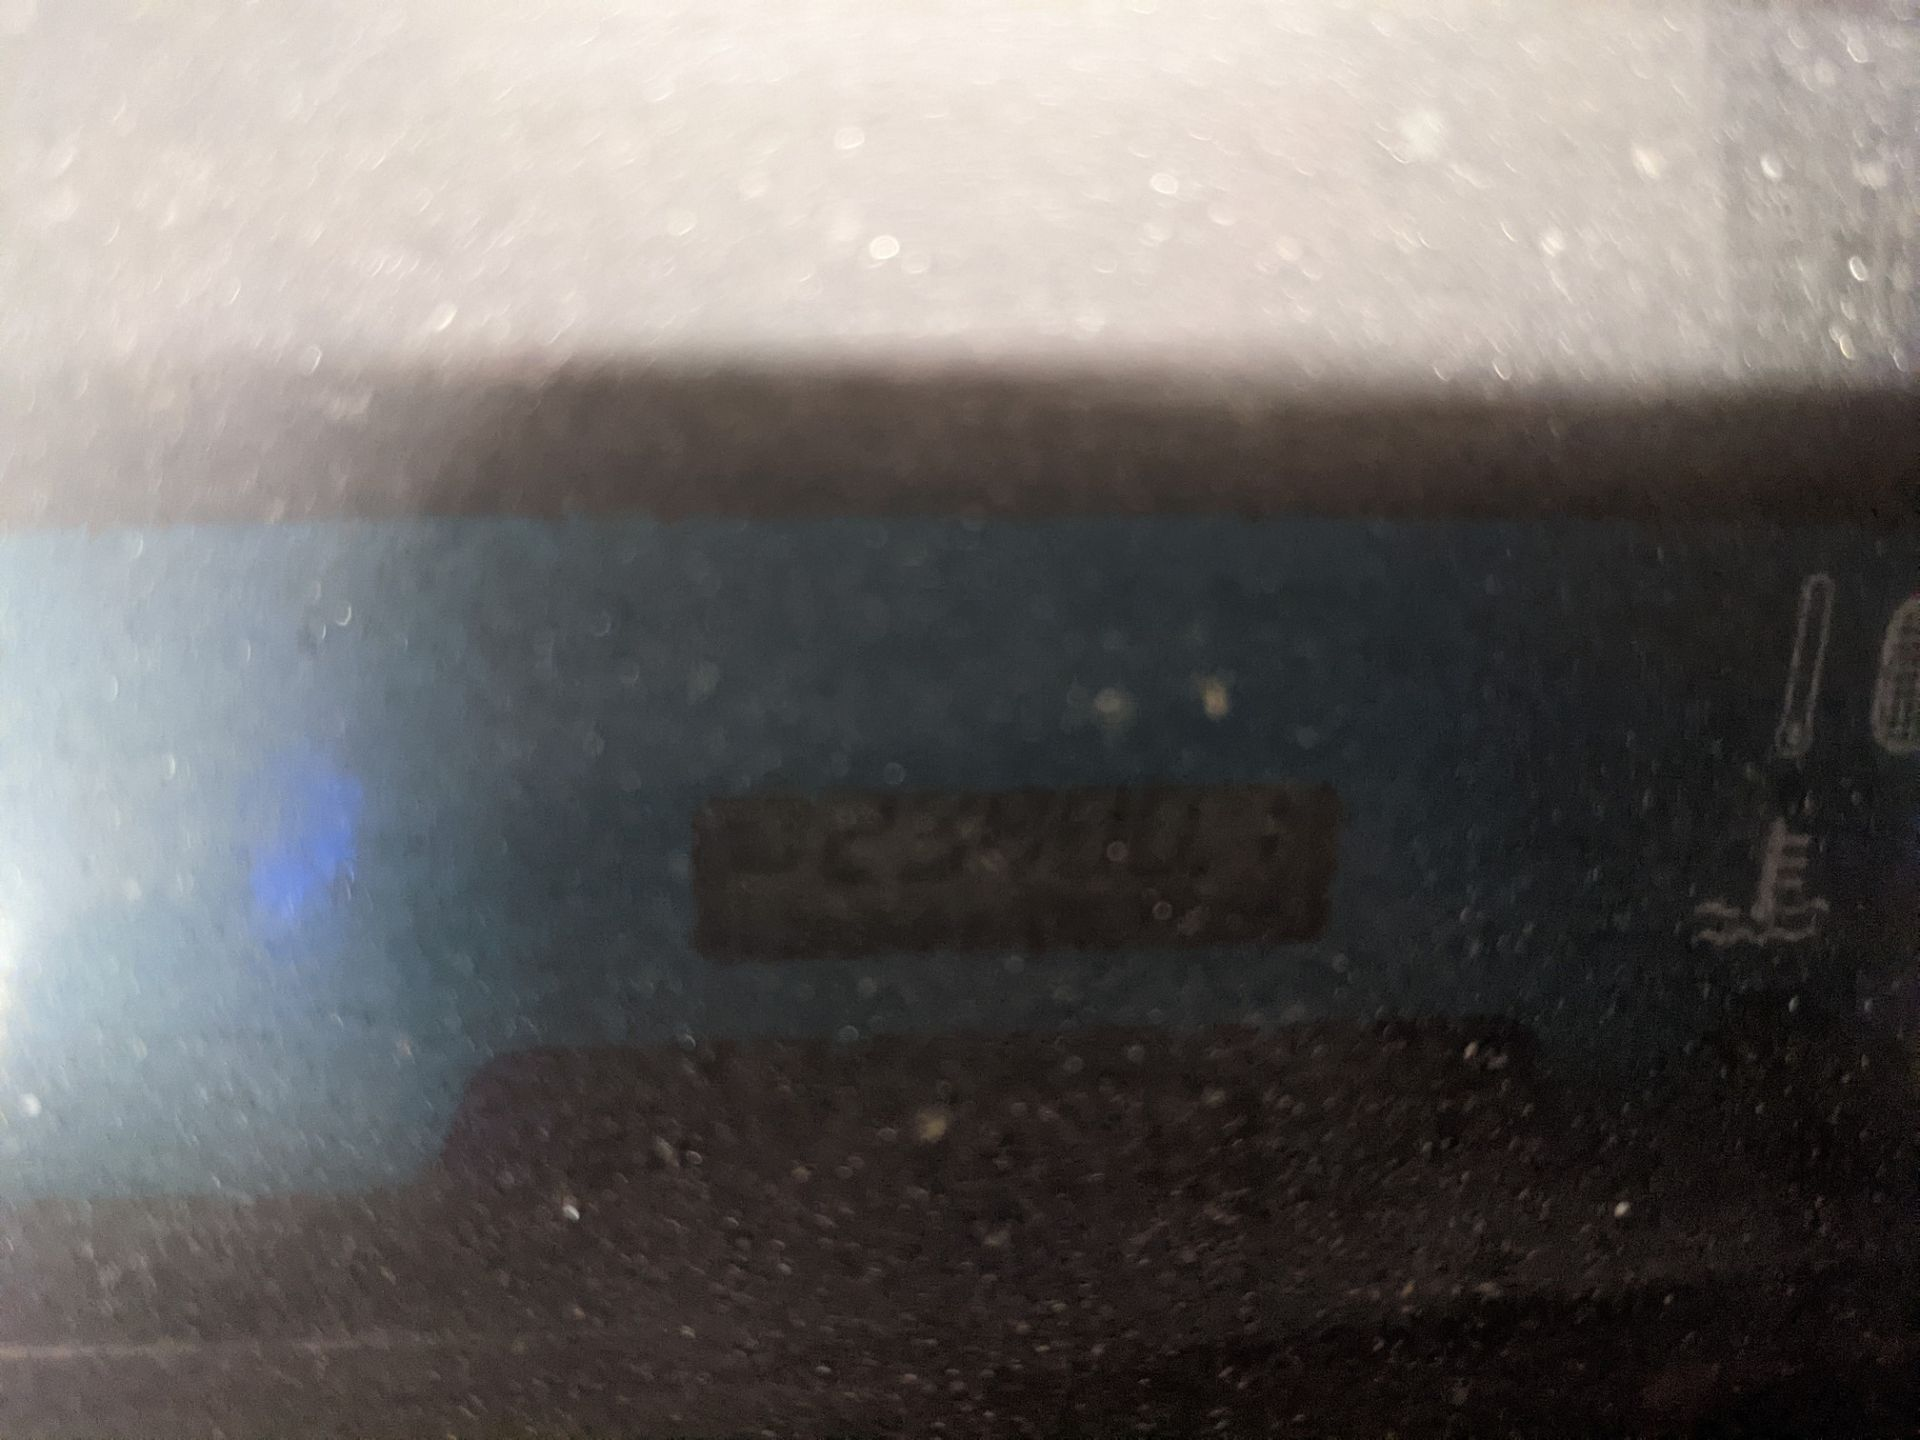 "TOYOTA 7FGCU30 PROPANE FORKLIFT, 5,120LB CAP., 187"" MAX LIFT, 3-STAGE MAST, SIDE SHIFT, S/N 60133, - Image 13 of 13"